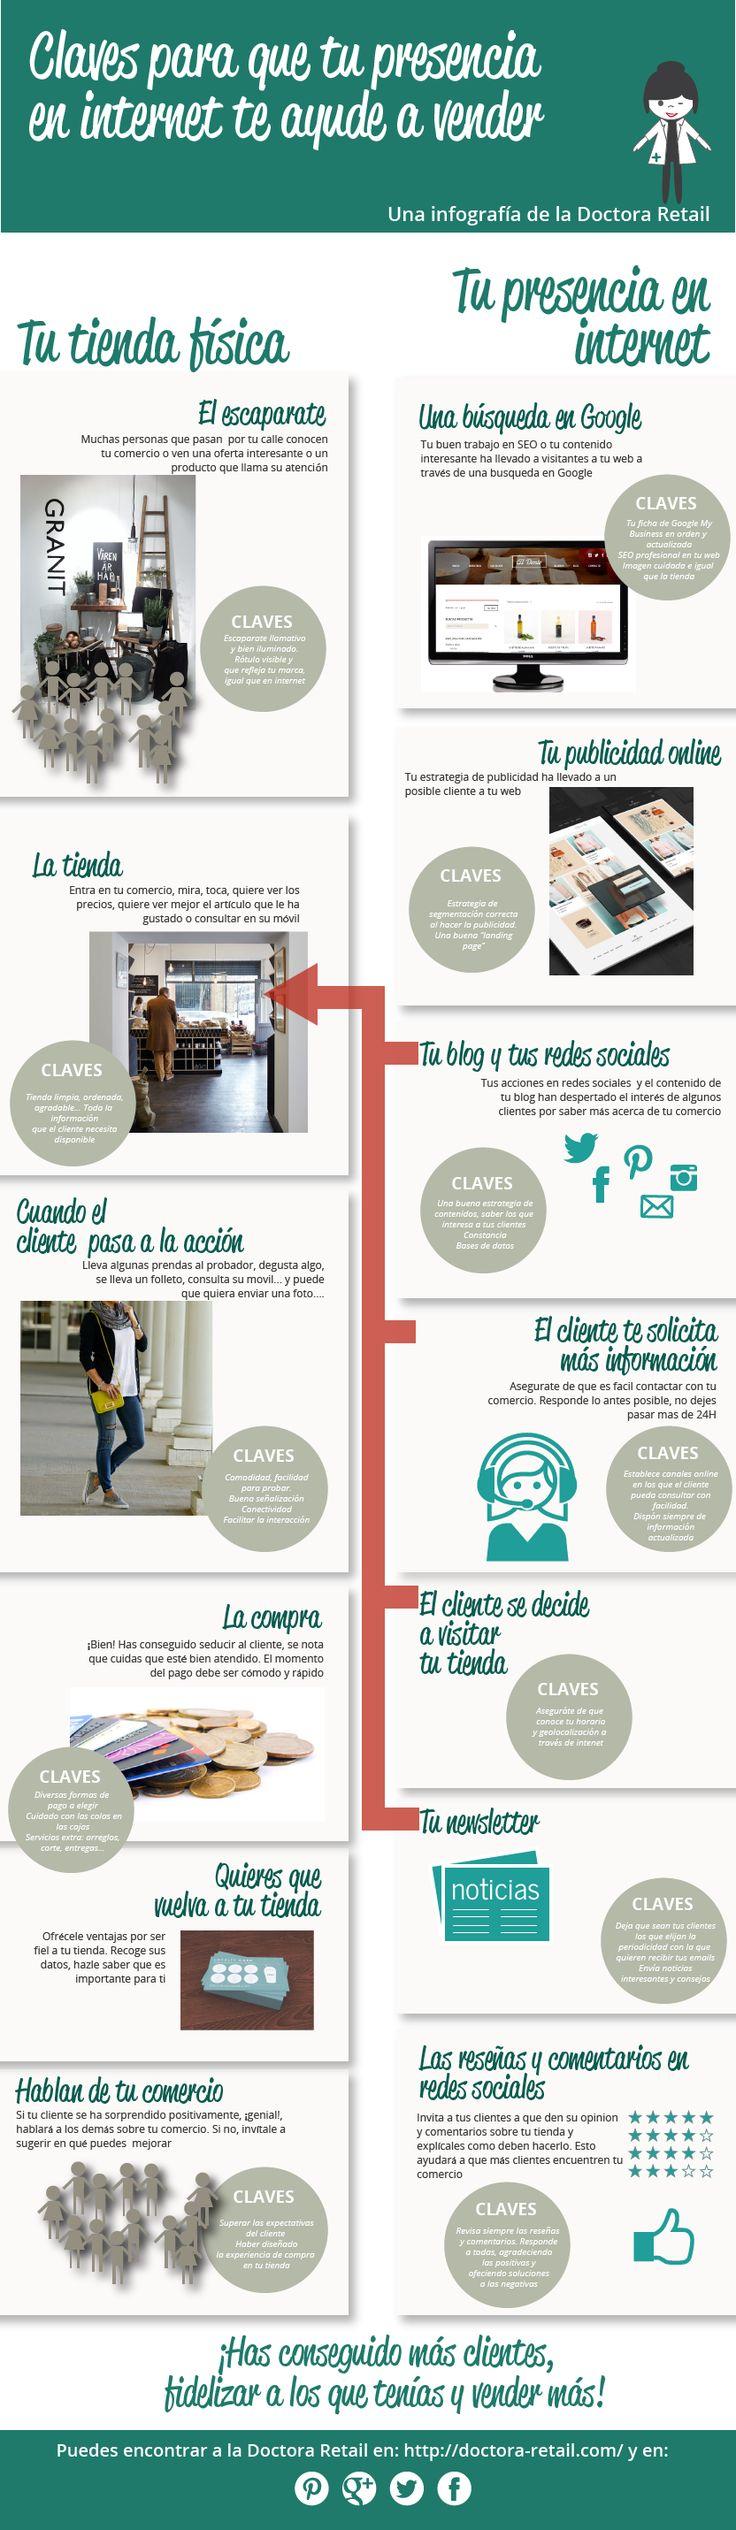 Infografía comercio físico en internet